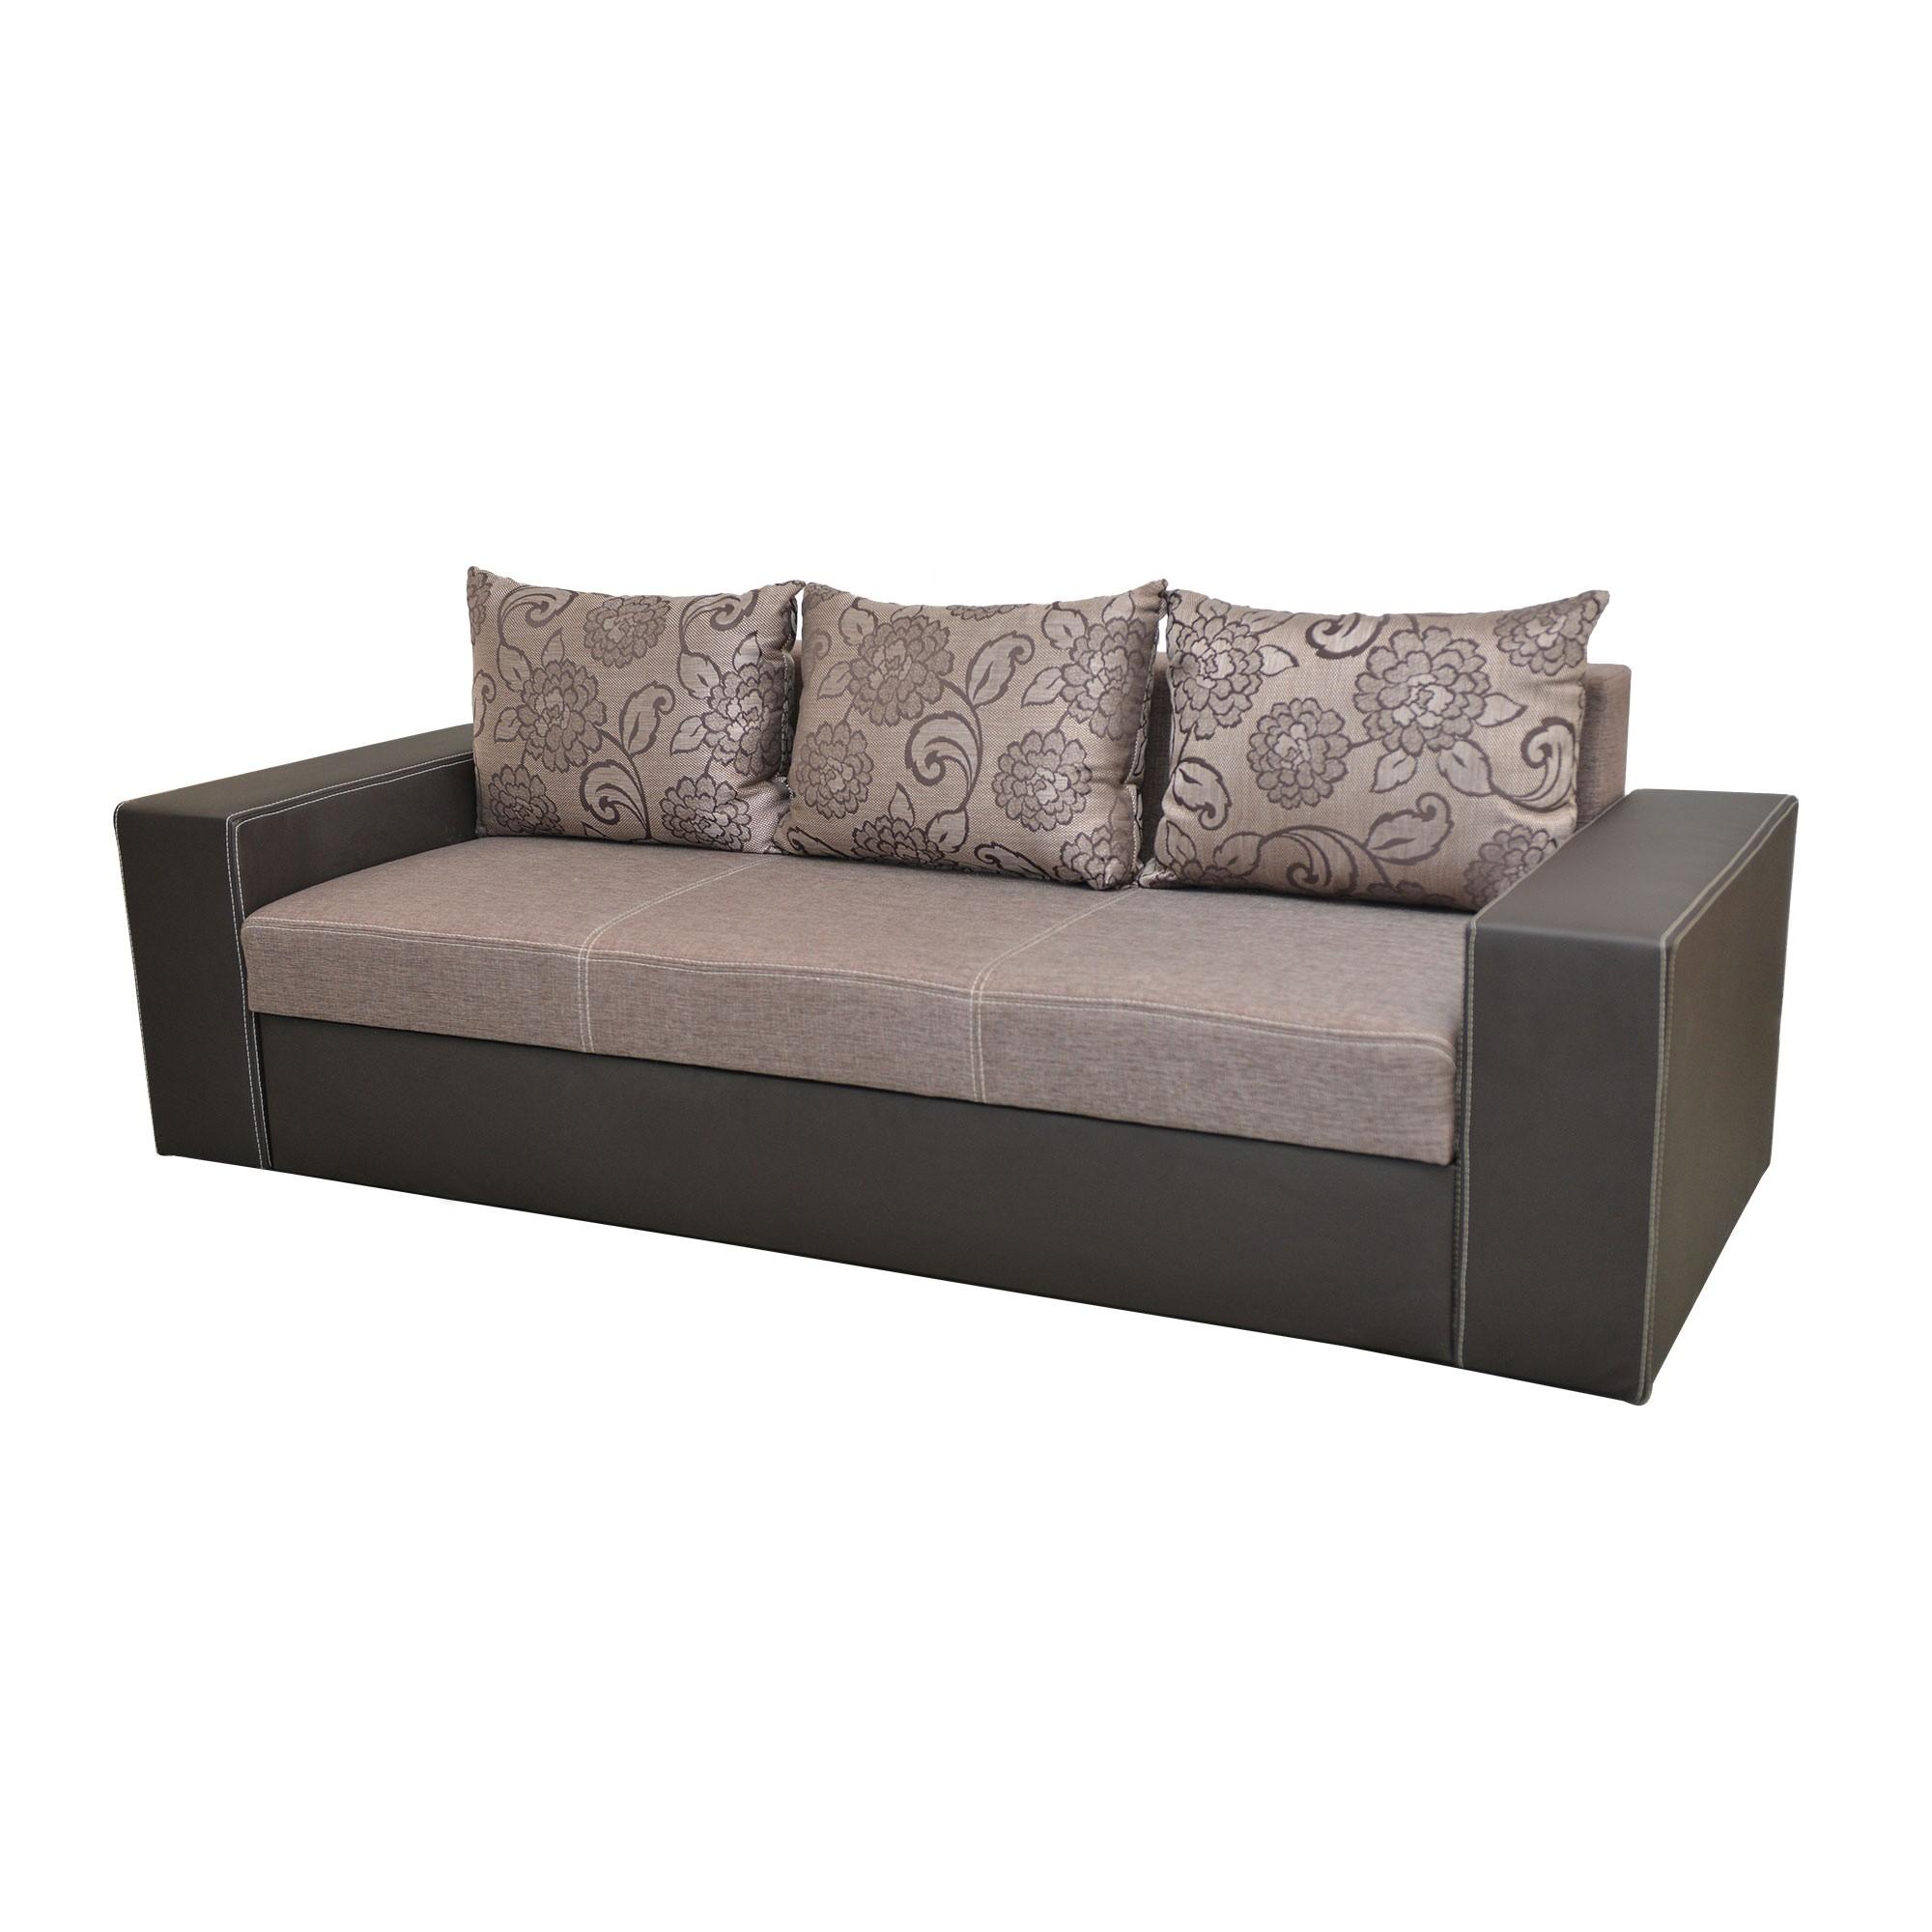 Dedeman canapea cuba varianta 6 3c dedicat planurilor tale for Canapele dedeman